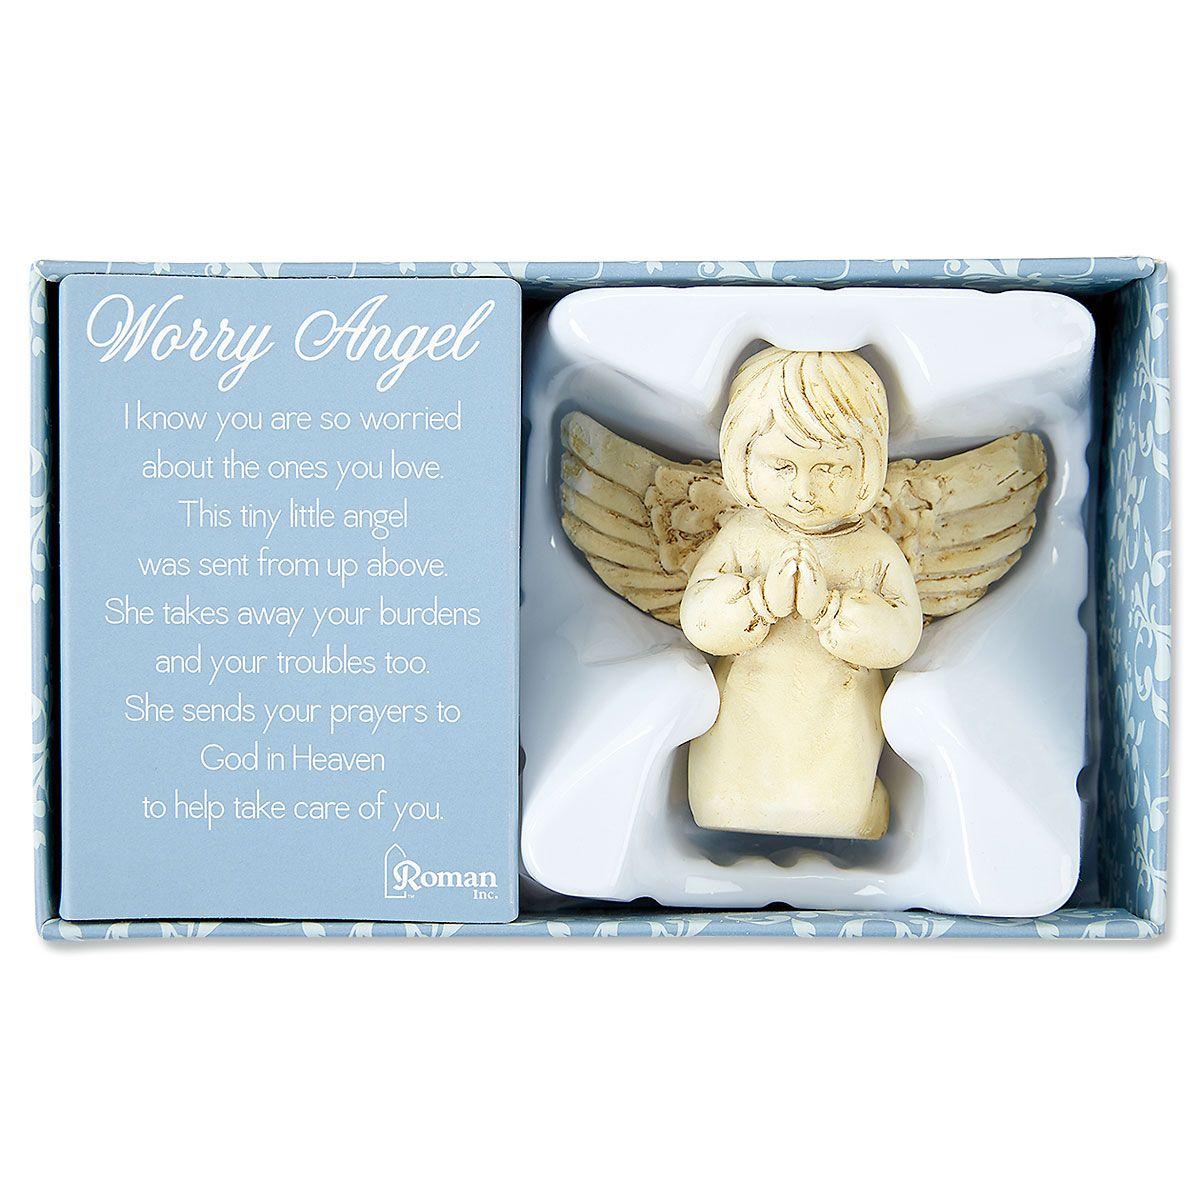 Worry Angel Keepsake